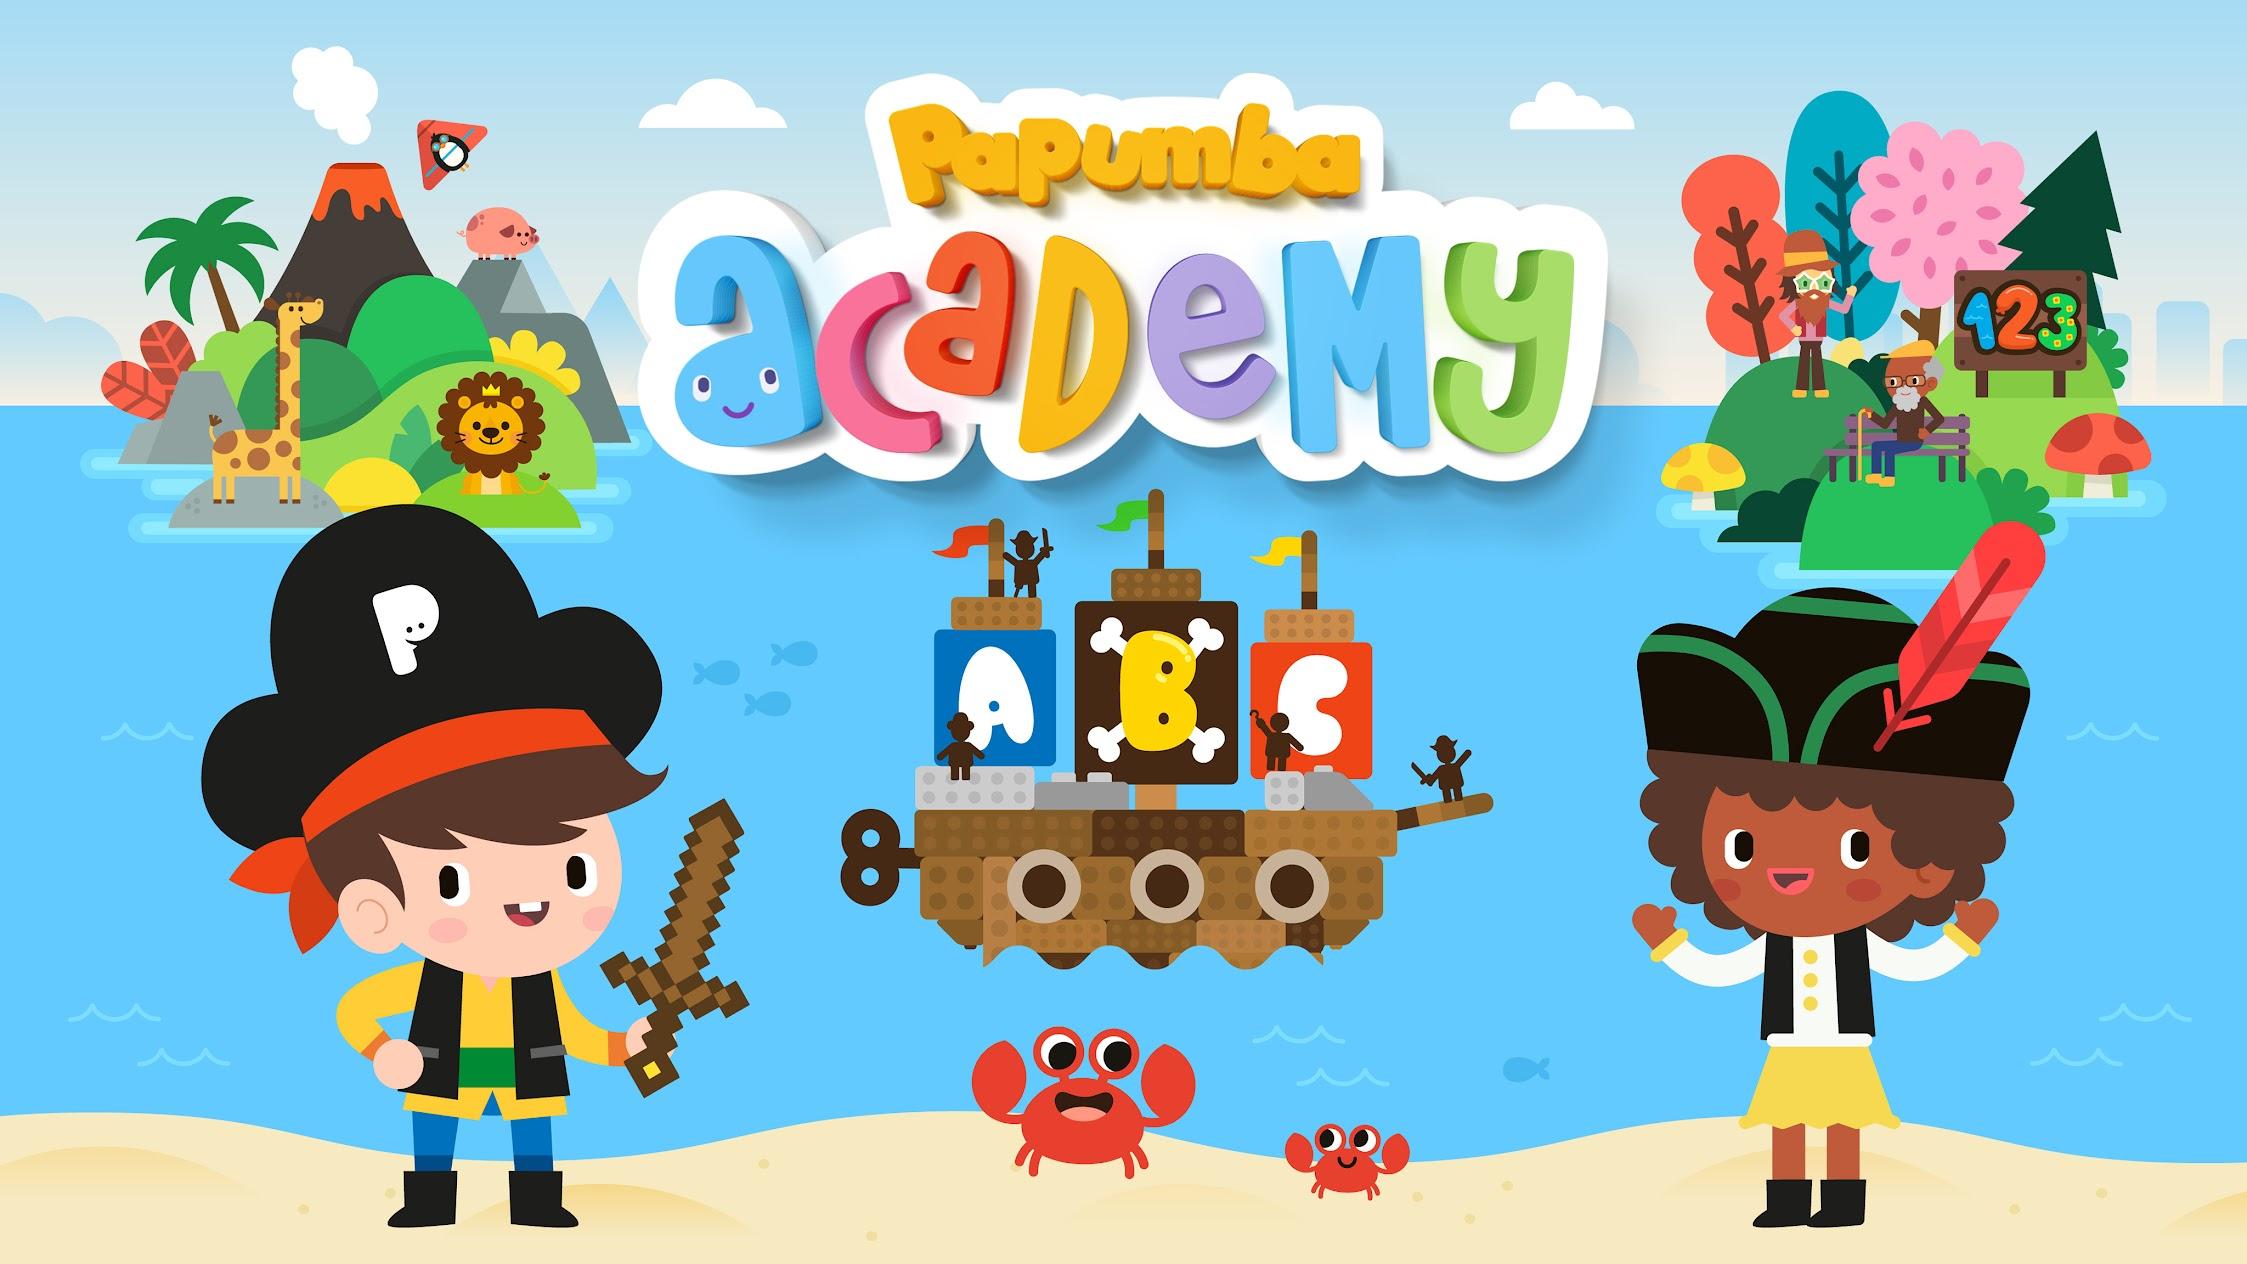 Risultati immagini per papumba academy